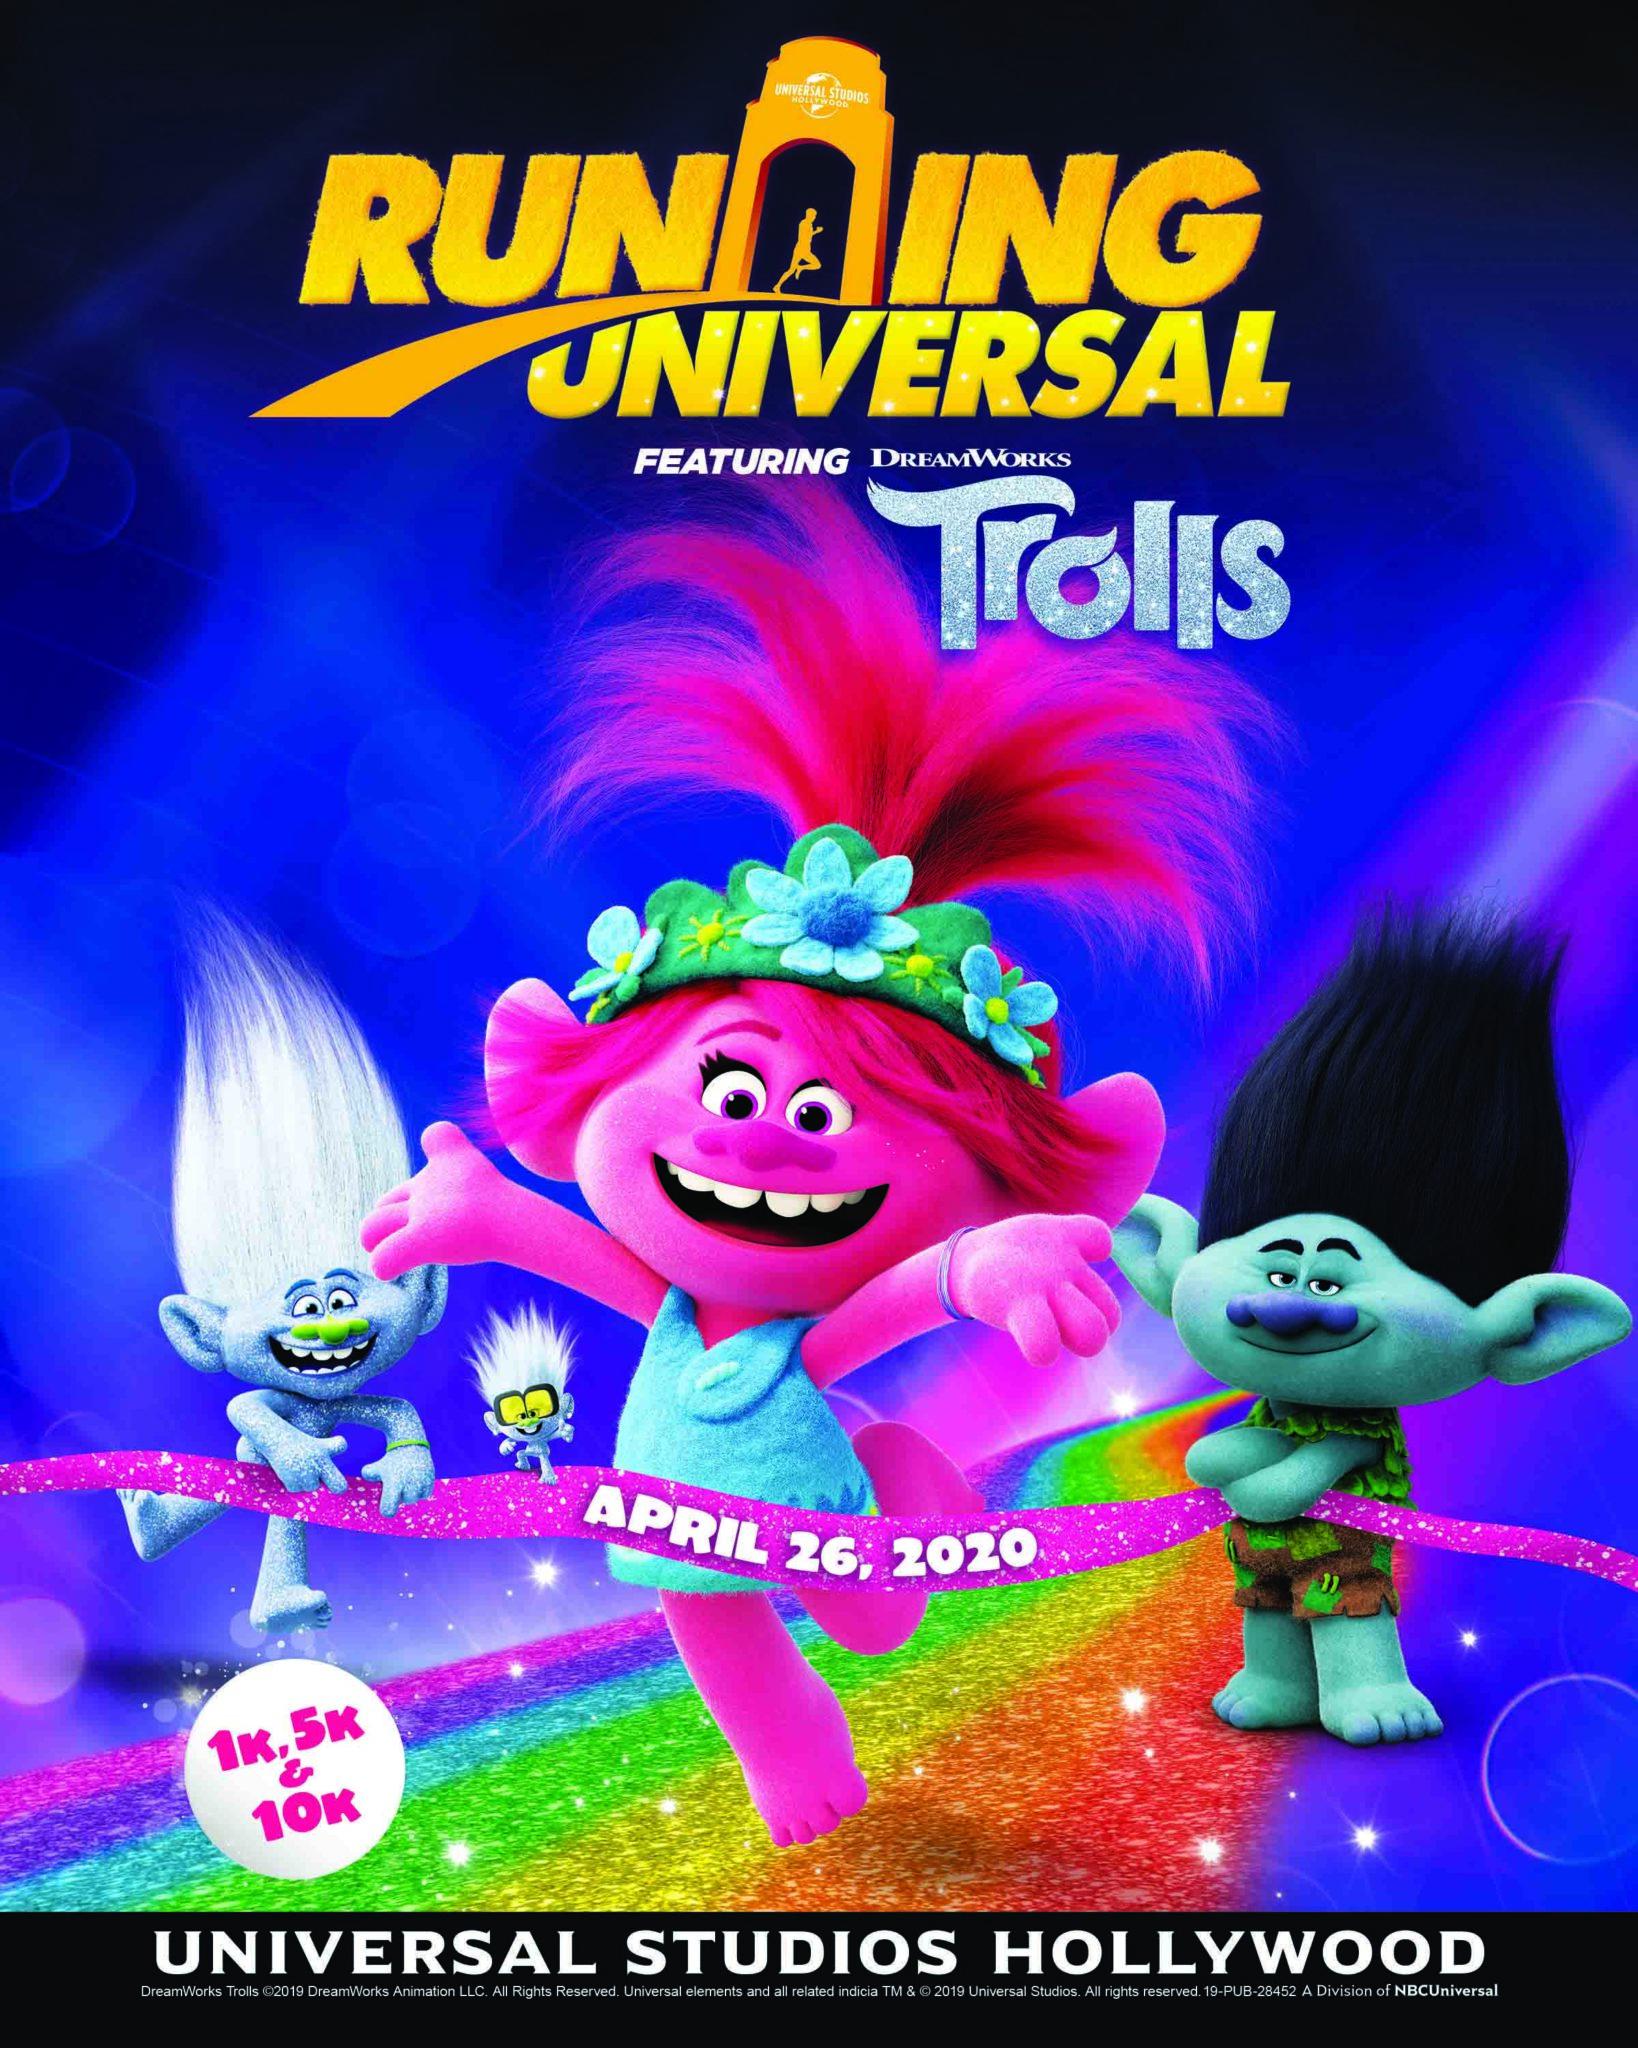 running universal trolls